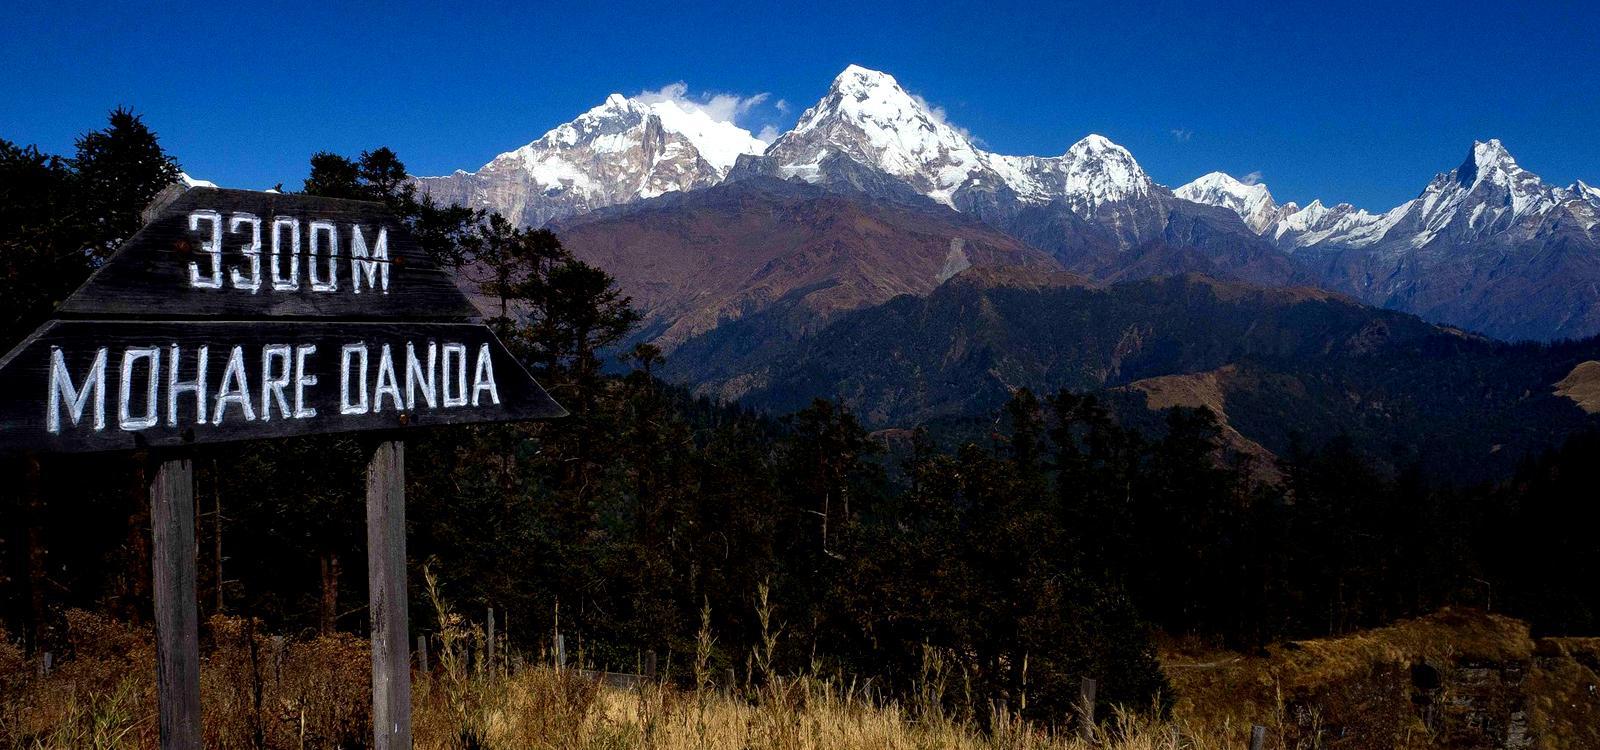 Mohare Danda Trek in the Annapurna Region